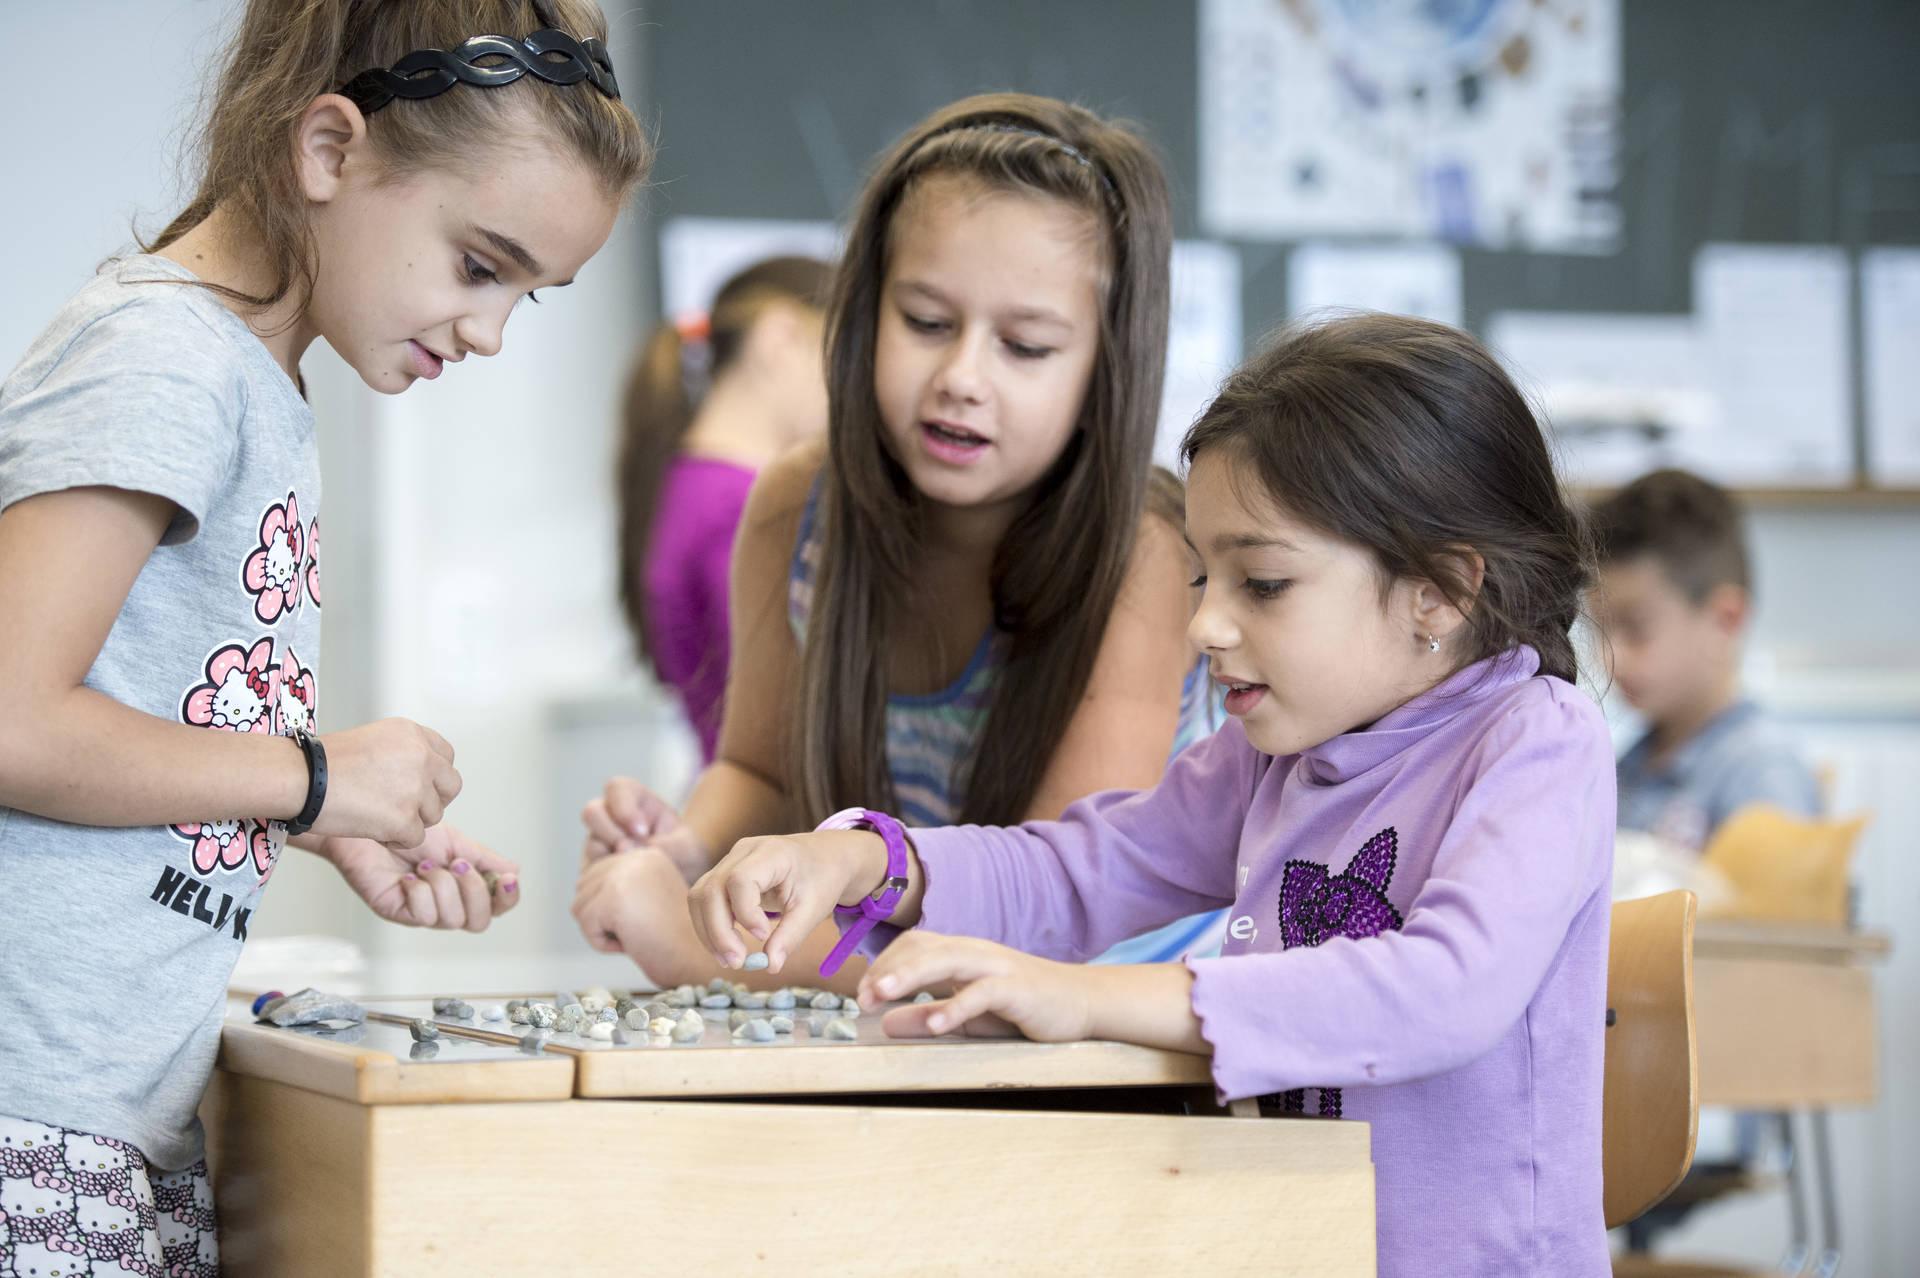 Der Unterricht nach dem neuen Lehrplan funktioniert an den Schulen des Kantons Bern gut.